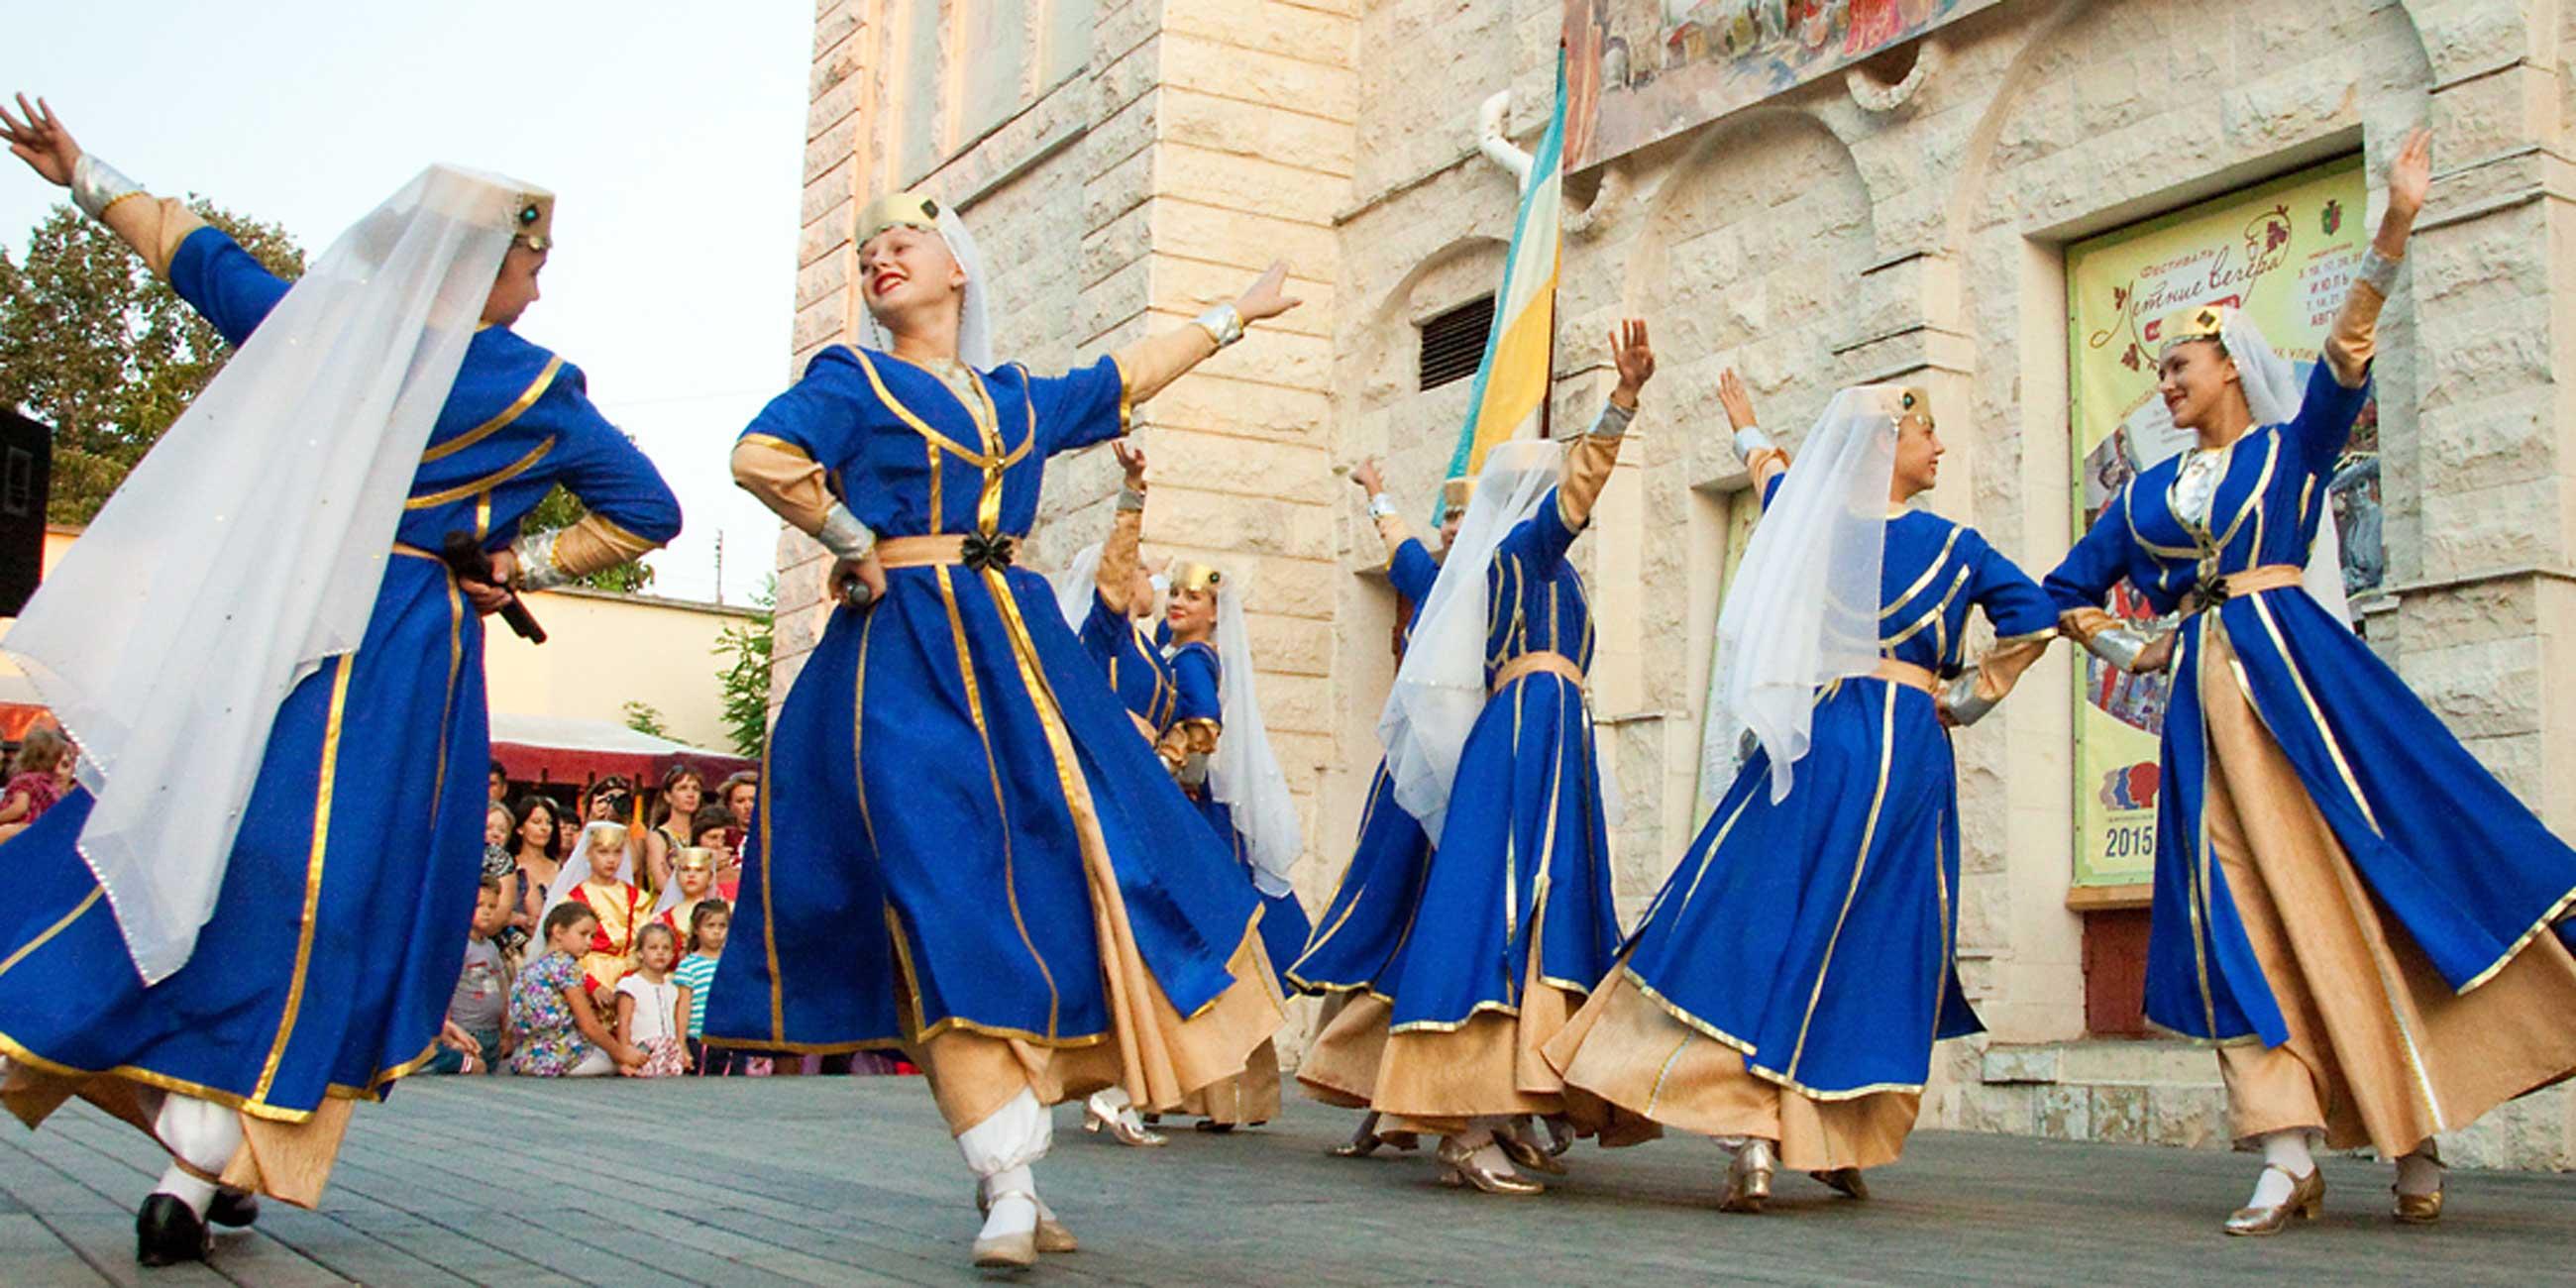 Летом на улицах Евпатории проходят городские фестивалиФото: Елена Покрепа